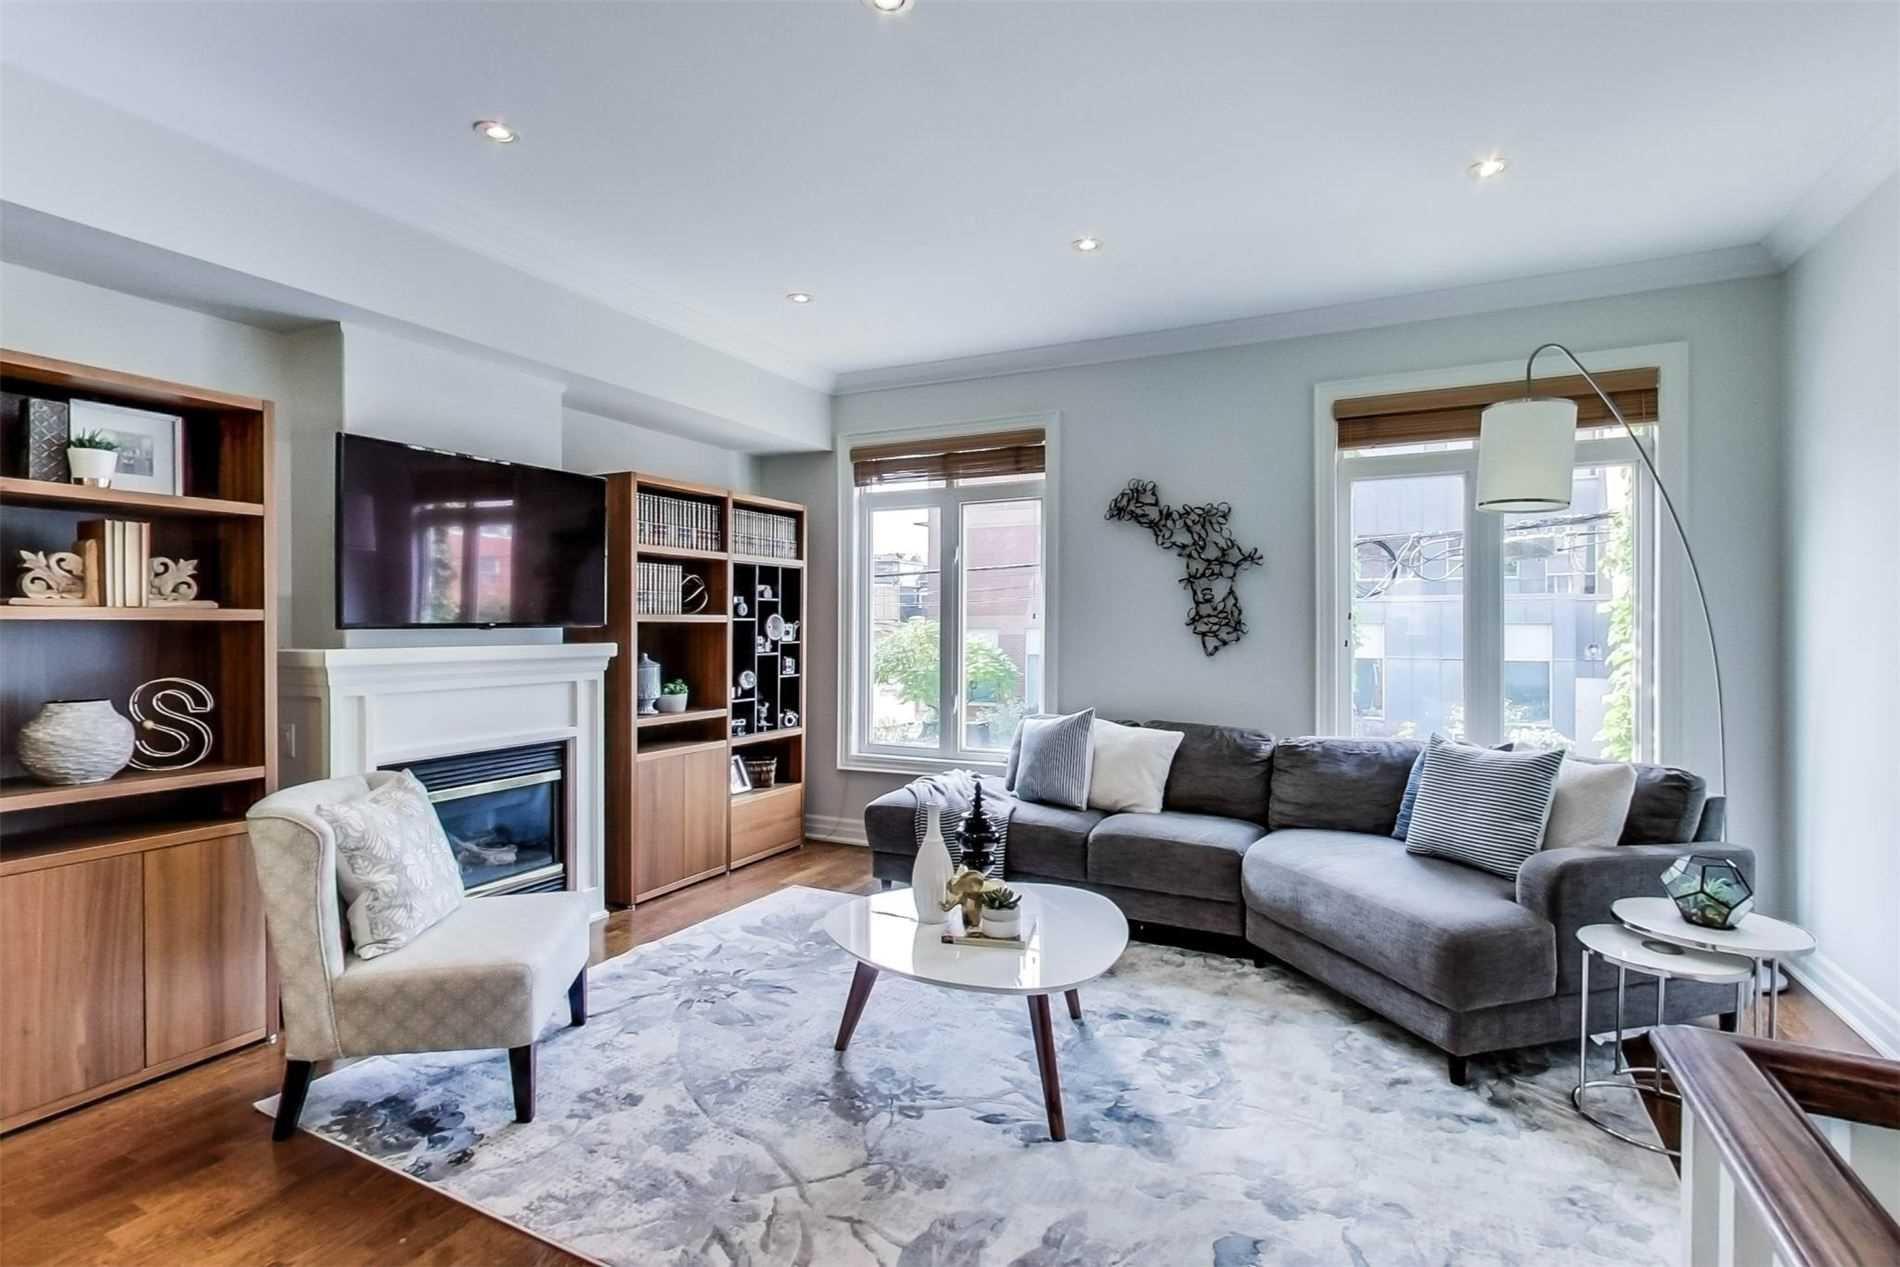 Photo 5: Photos: 213 Heward Avenue in Toronto: South Riverdale House (3-Storey) for sale (Toronto E01)  : MLS®# E4941877